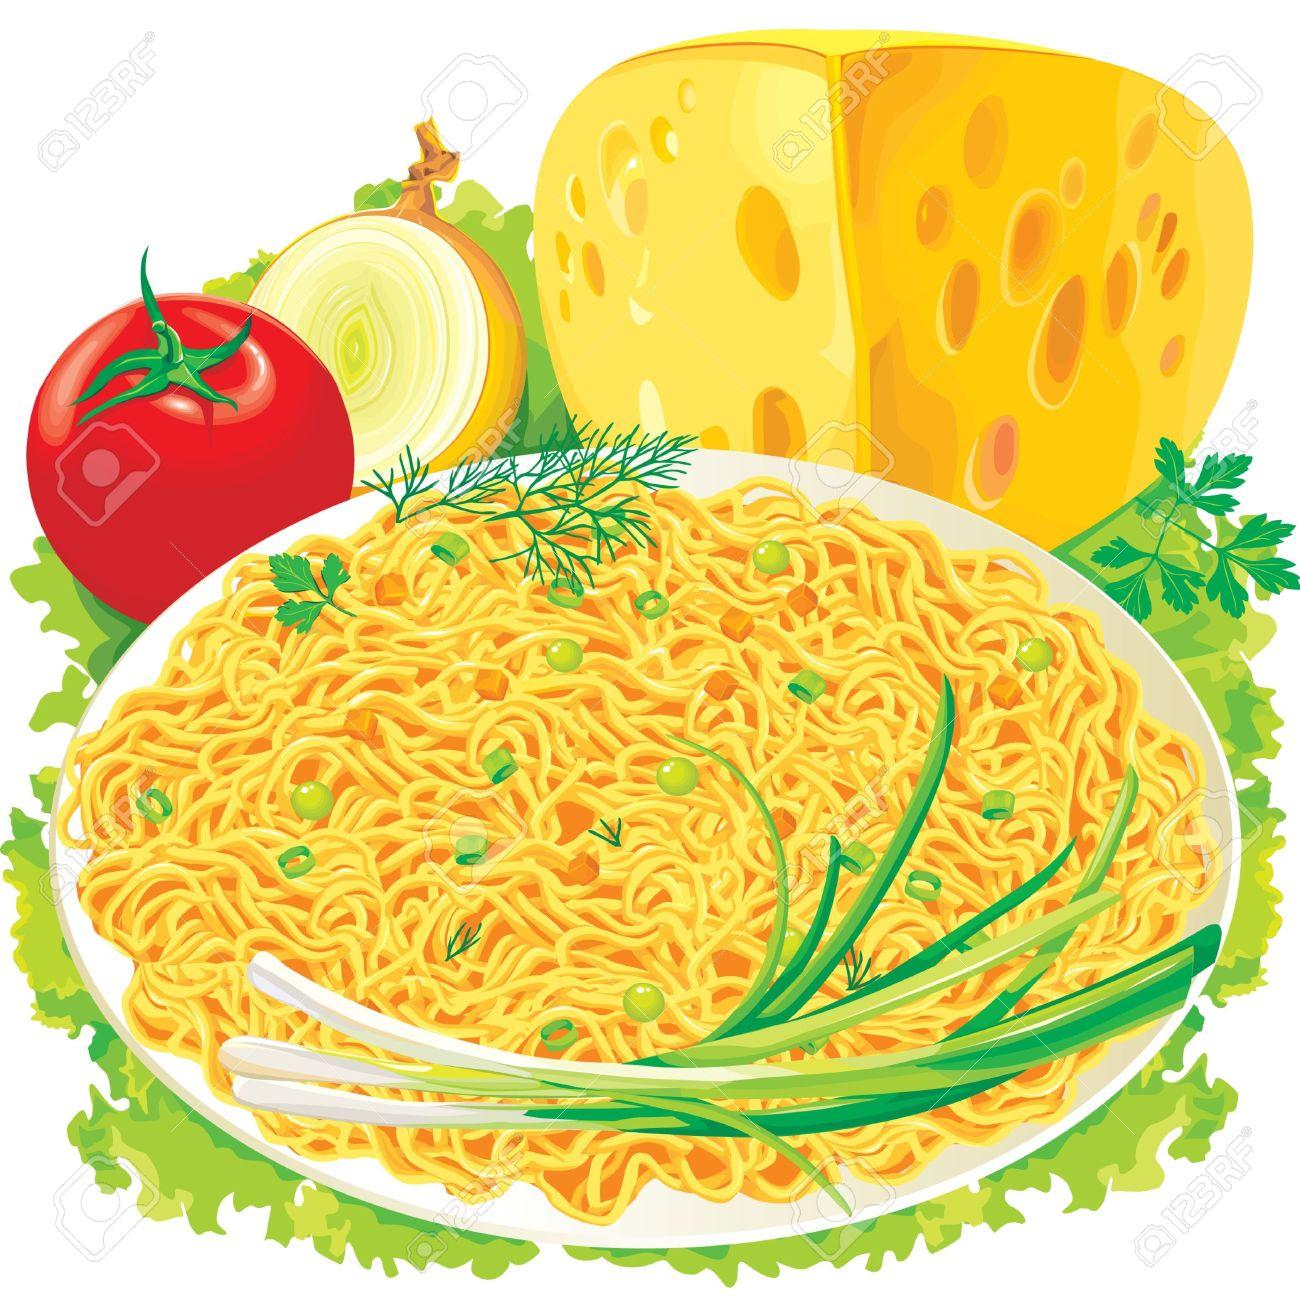 Spaghetti clipart vector Clipart images Spaghetti free stonetire